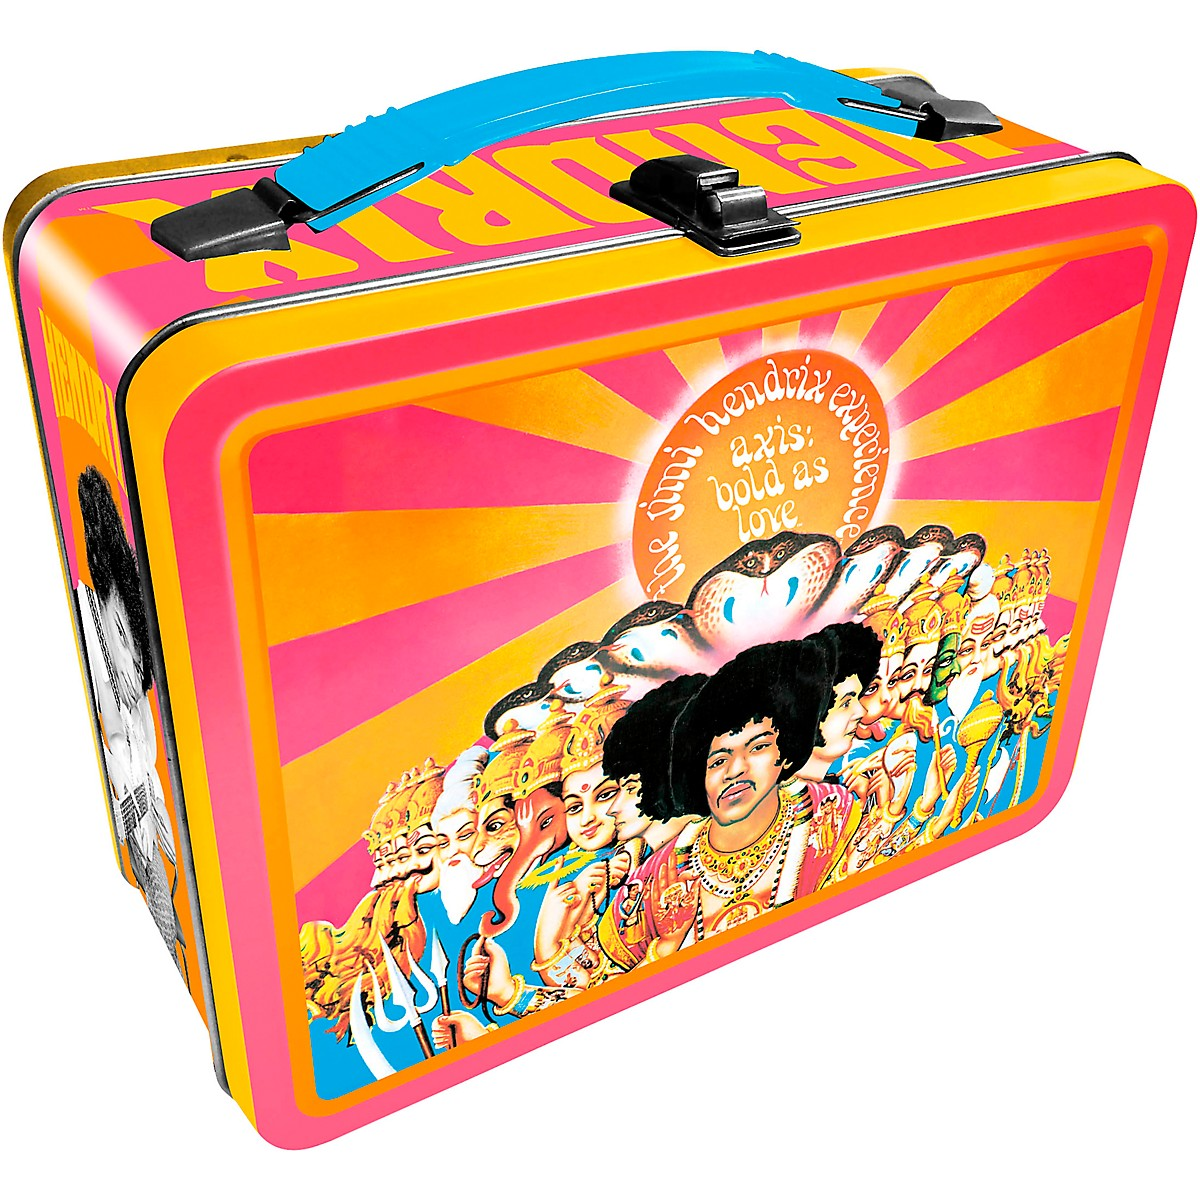 Hal Leonard Jimi Hendrix Axis Bold as Love Lunch Box